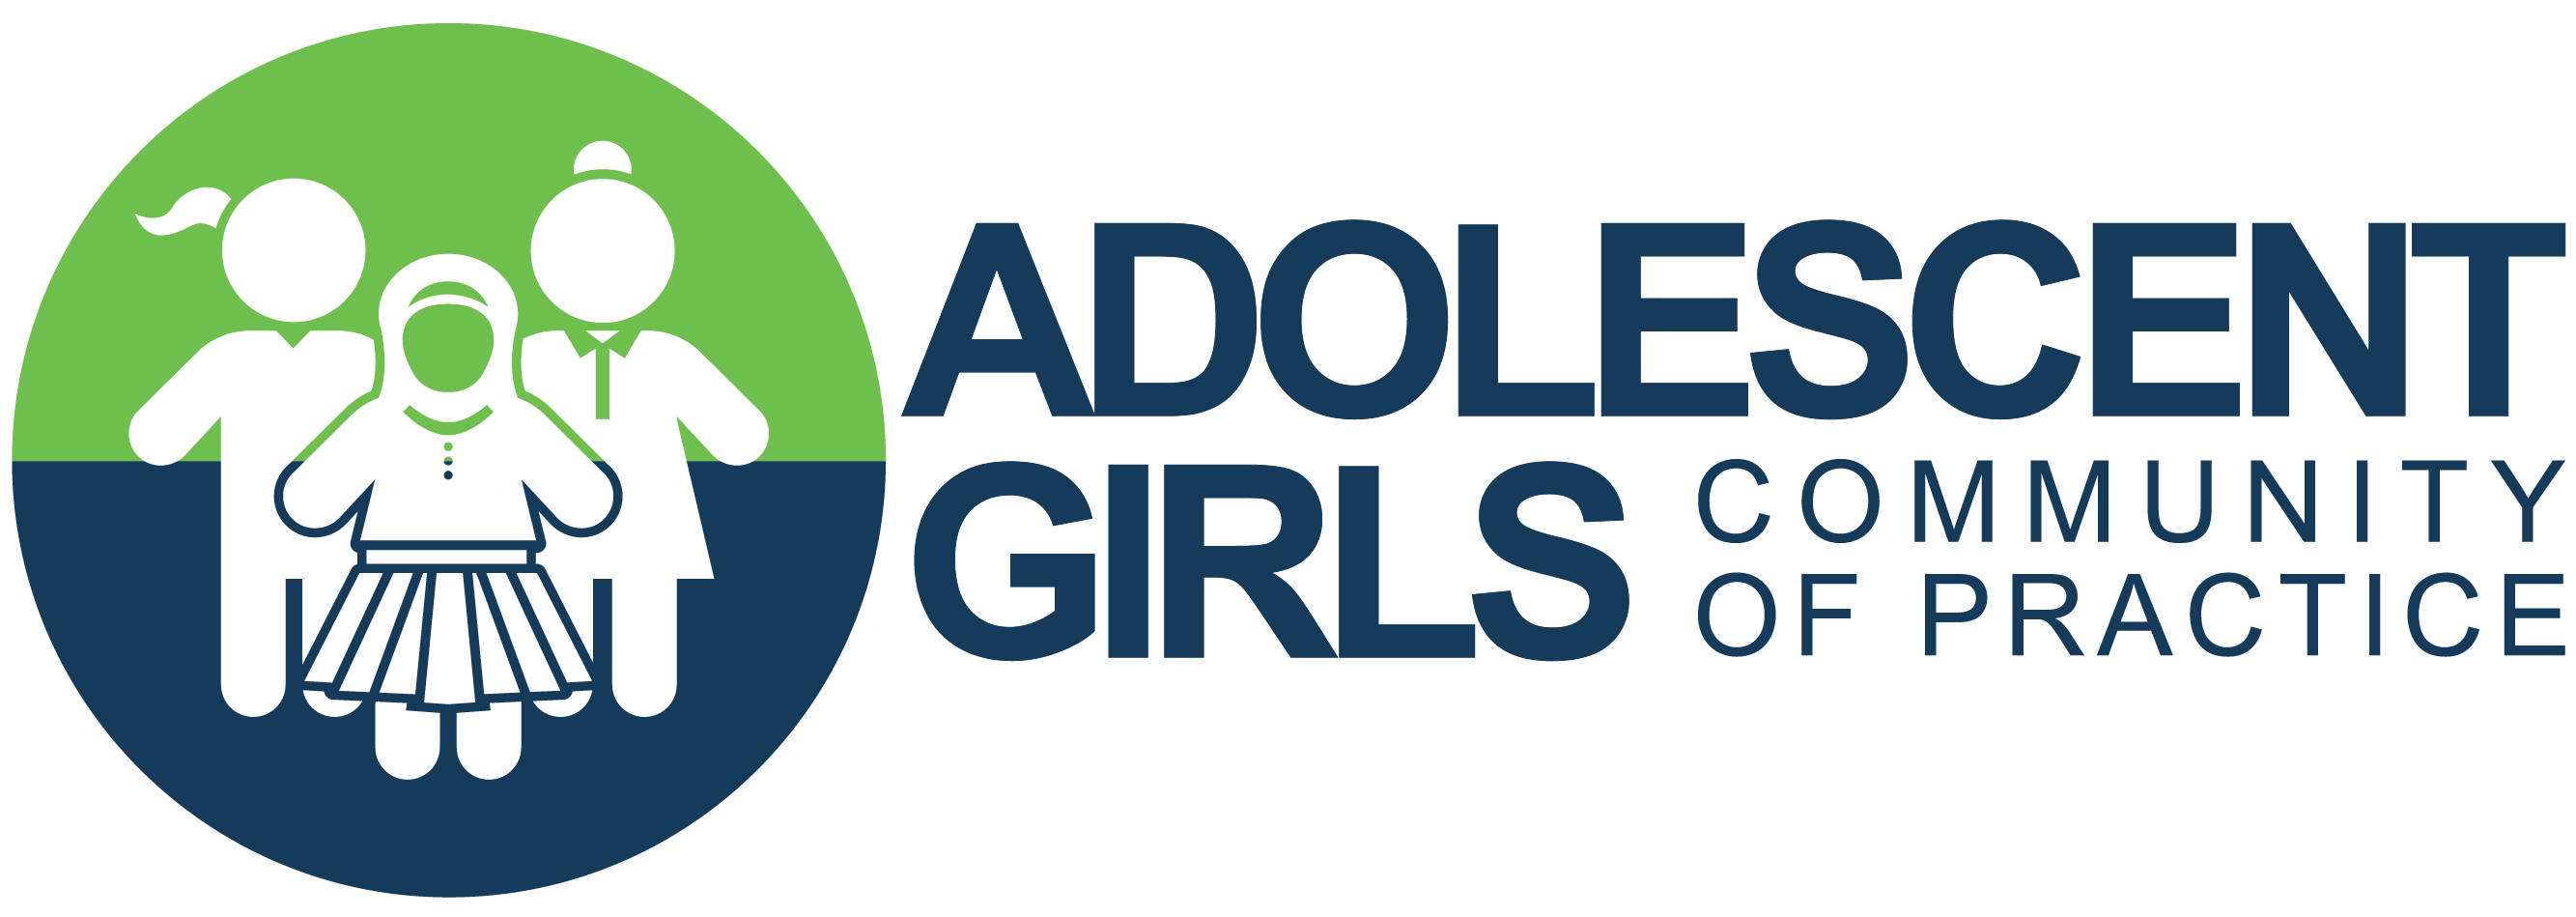 Adolescent Girls Community of Practice